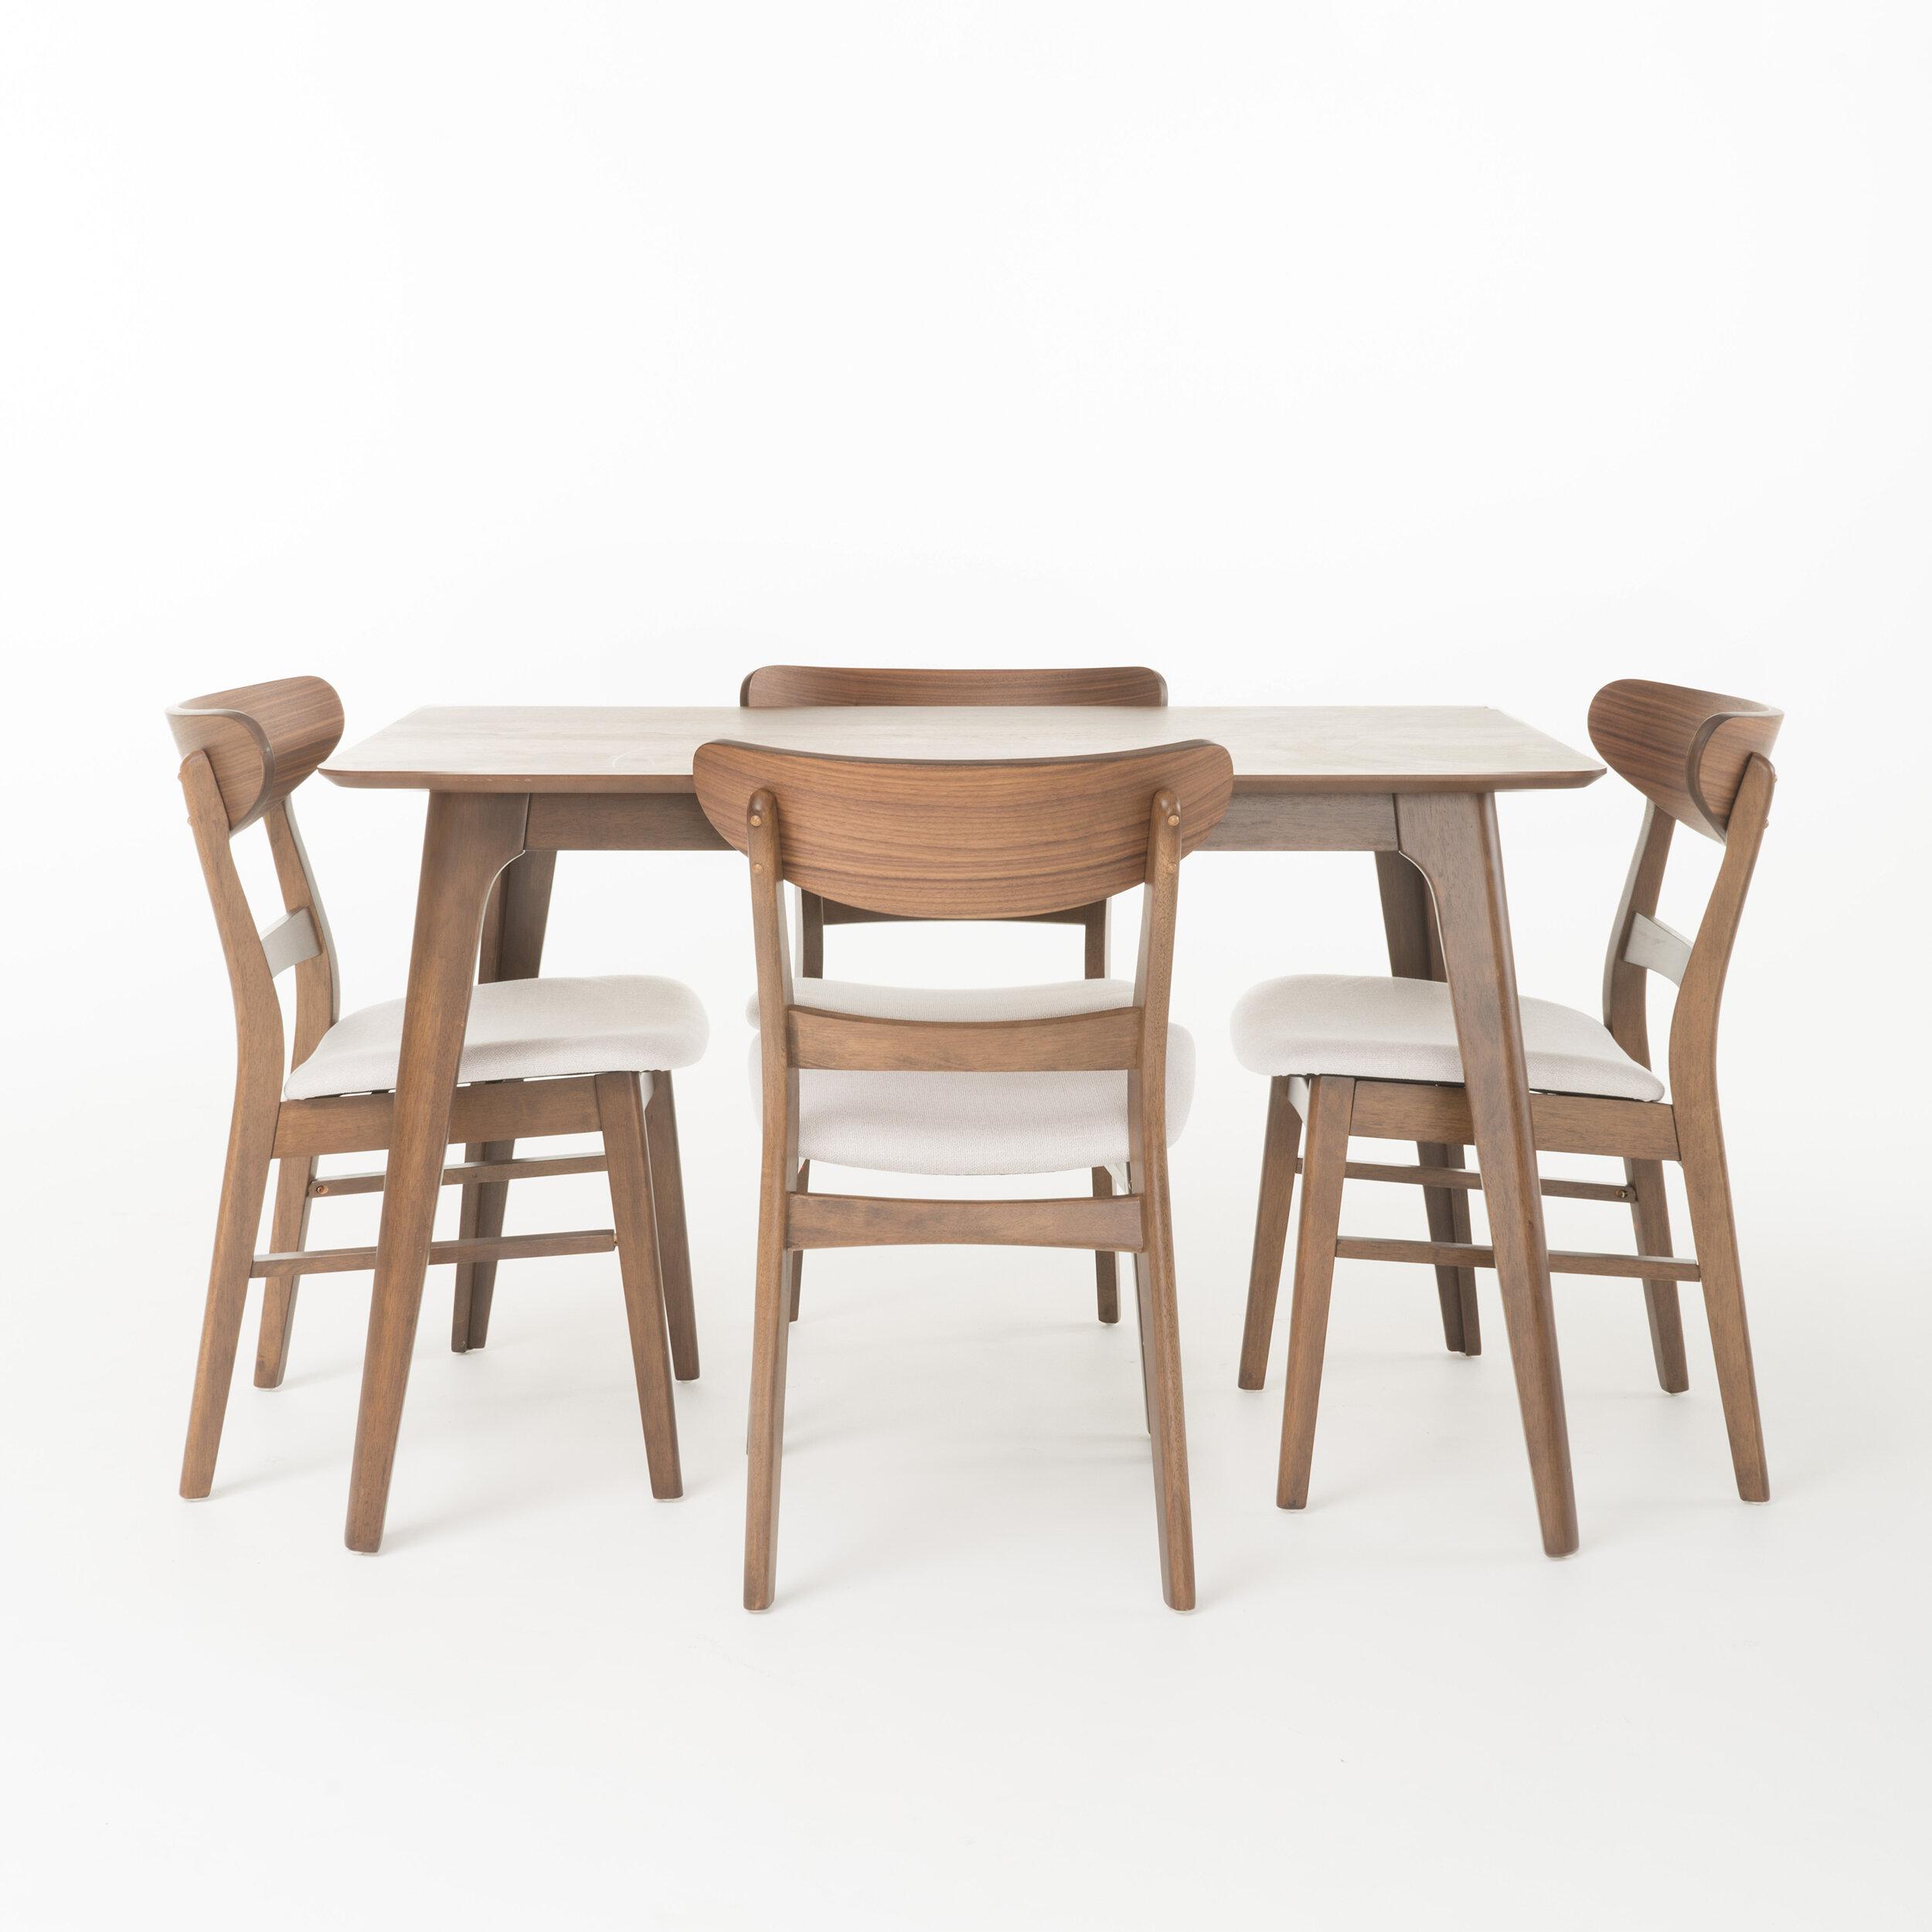 George Oliver Eshaan 5 Piece Solid Wood Dining Set Reviews Wayfair